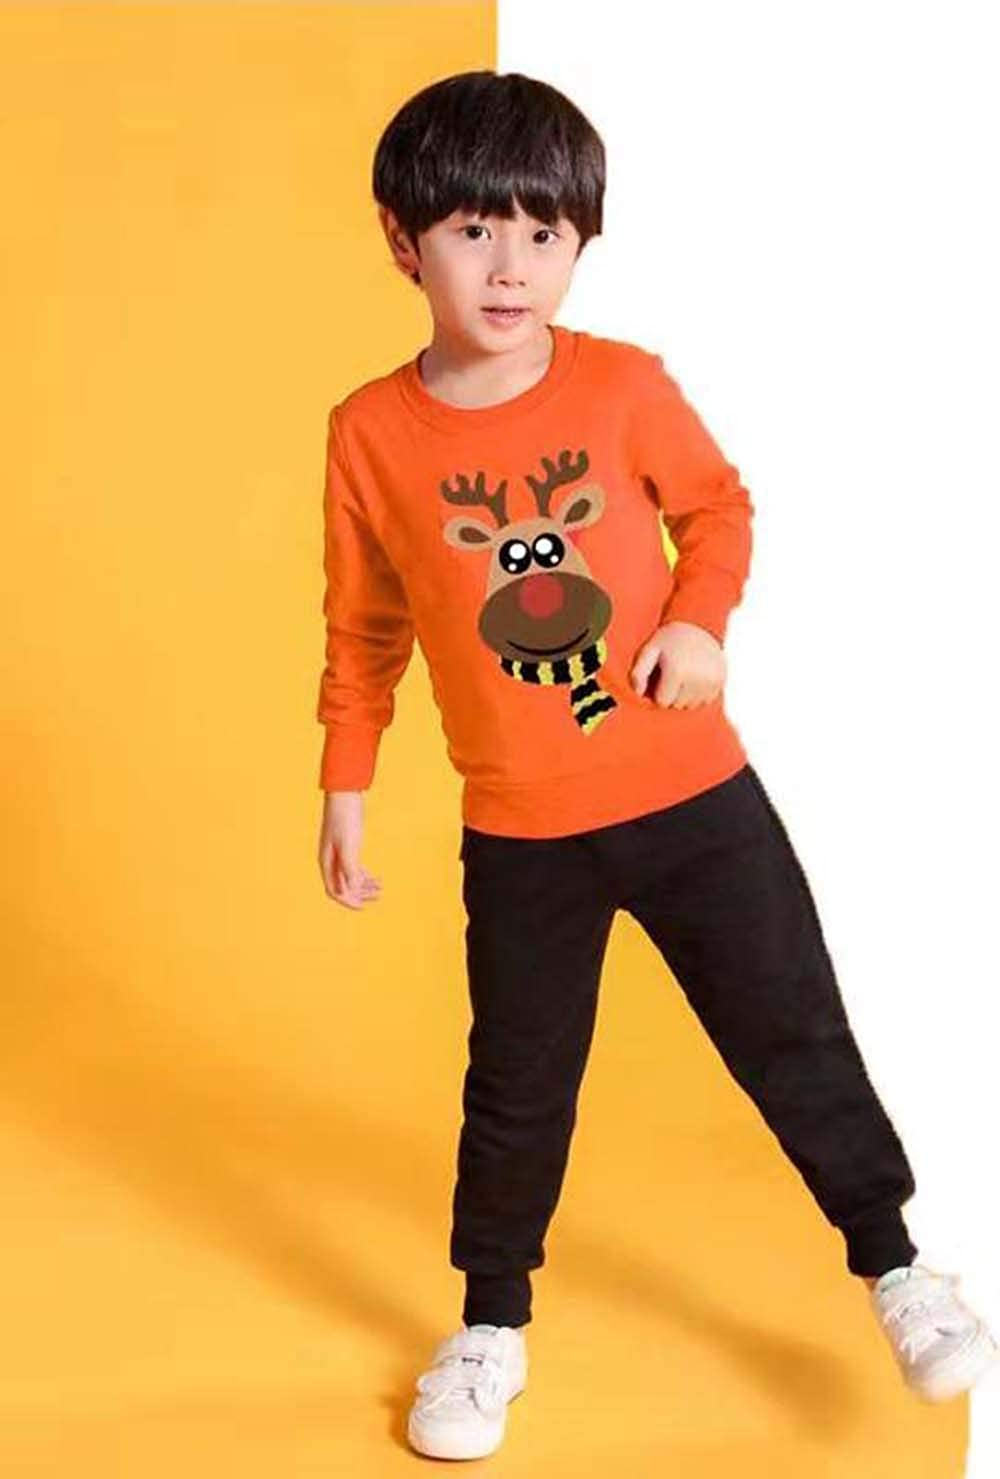 Family Christmas Sweatshirt Deer Print Long Sleeve T-Shirt Tops Matching Fall Winter Blouse Tops Outfits